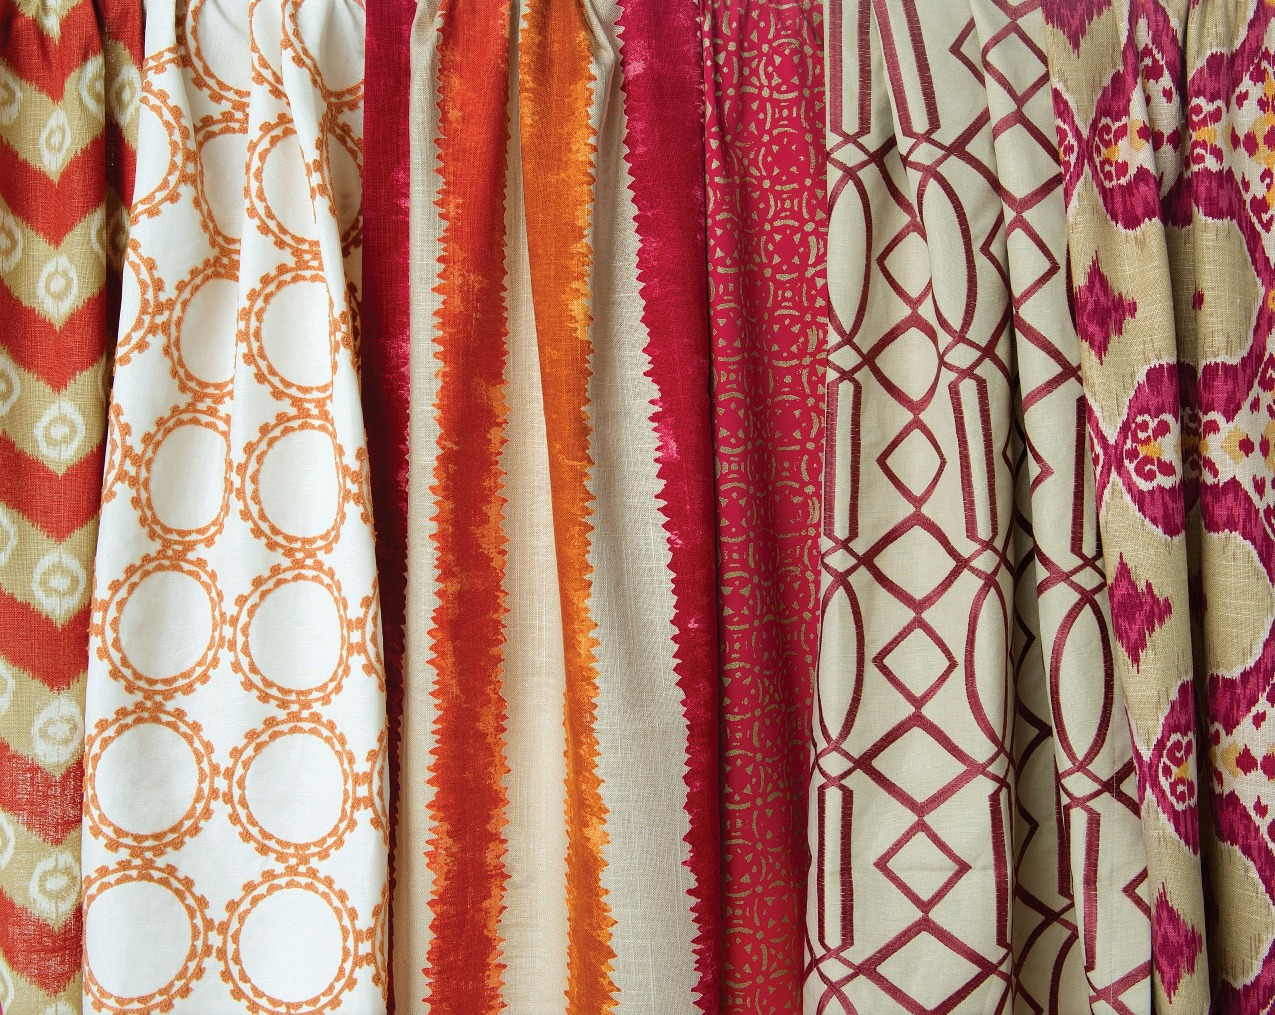 Isabelle de Borchgrave Fabrics, global fabric designs, global printed fabrics